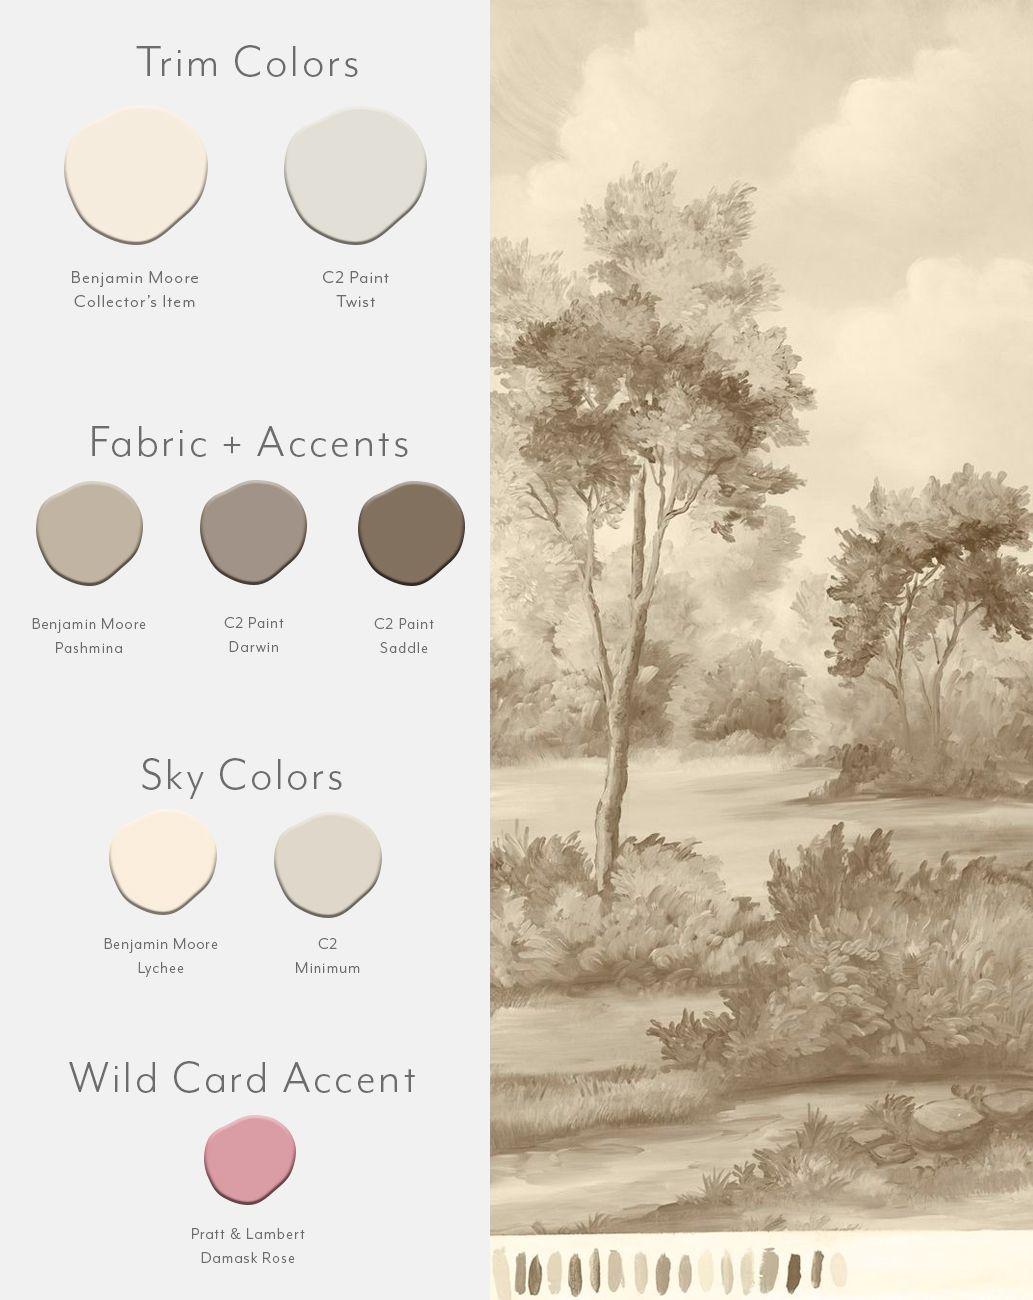 Order Mural Wallpaper Samples Susan Harter Muralpapers Exterior Paint Colors For House Paint Colors Benjamin Moore Paint Colors For Home